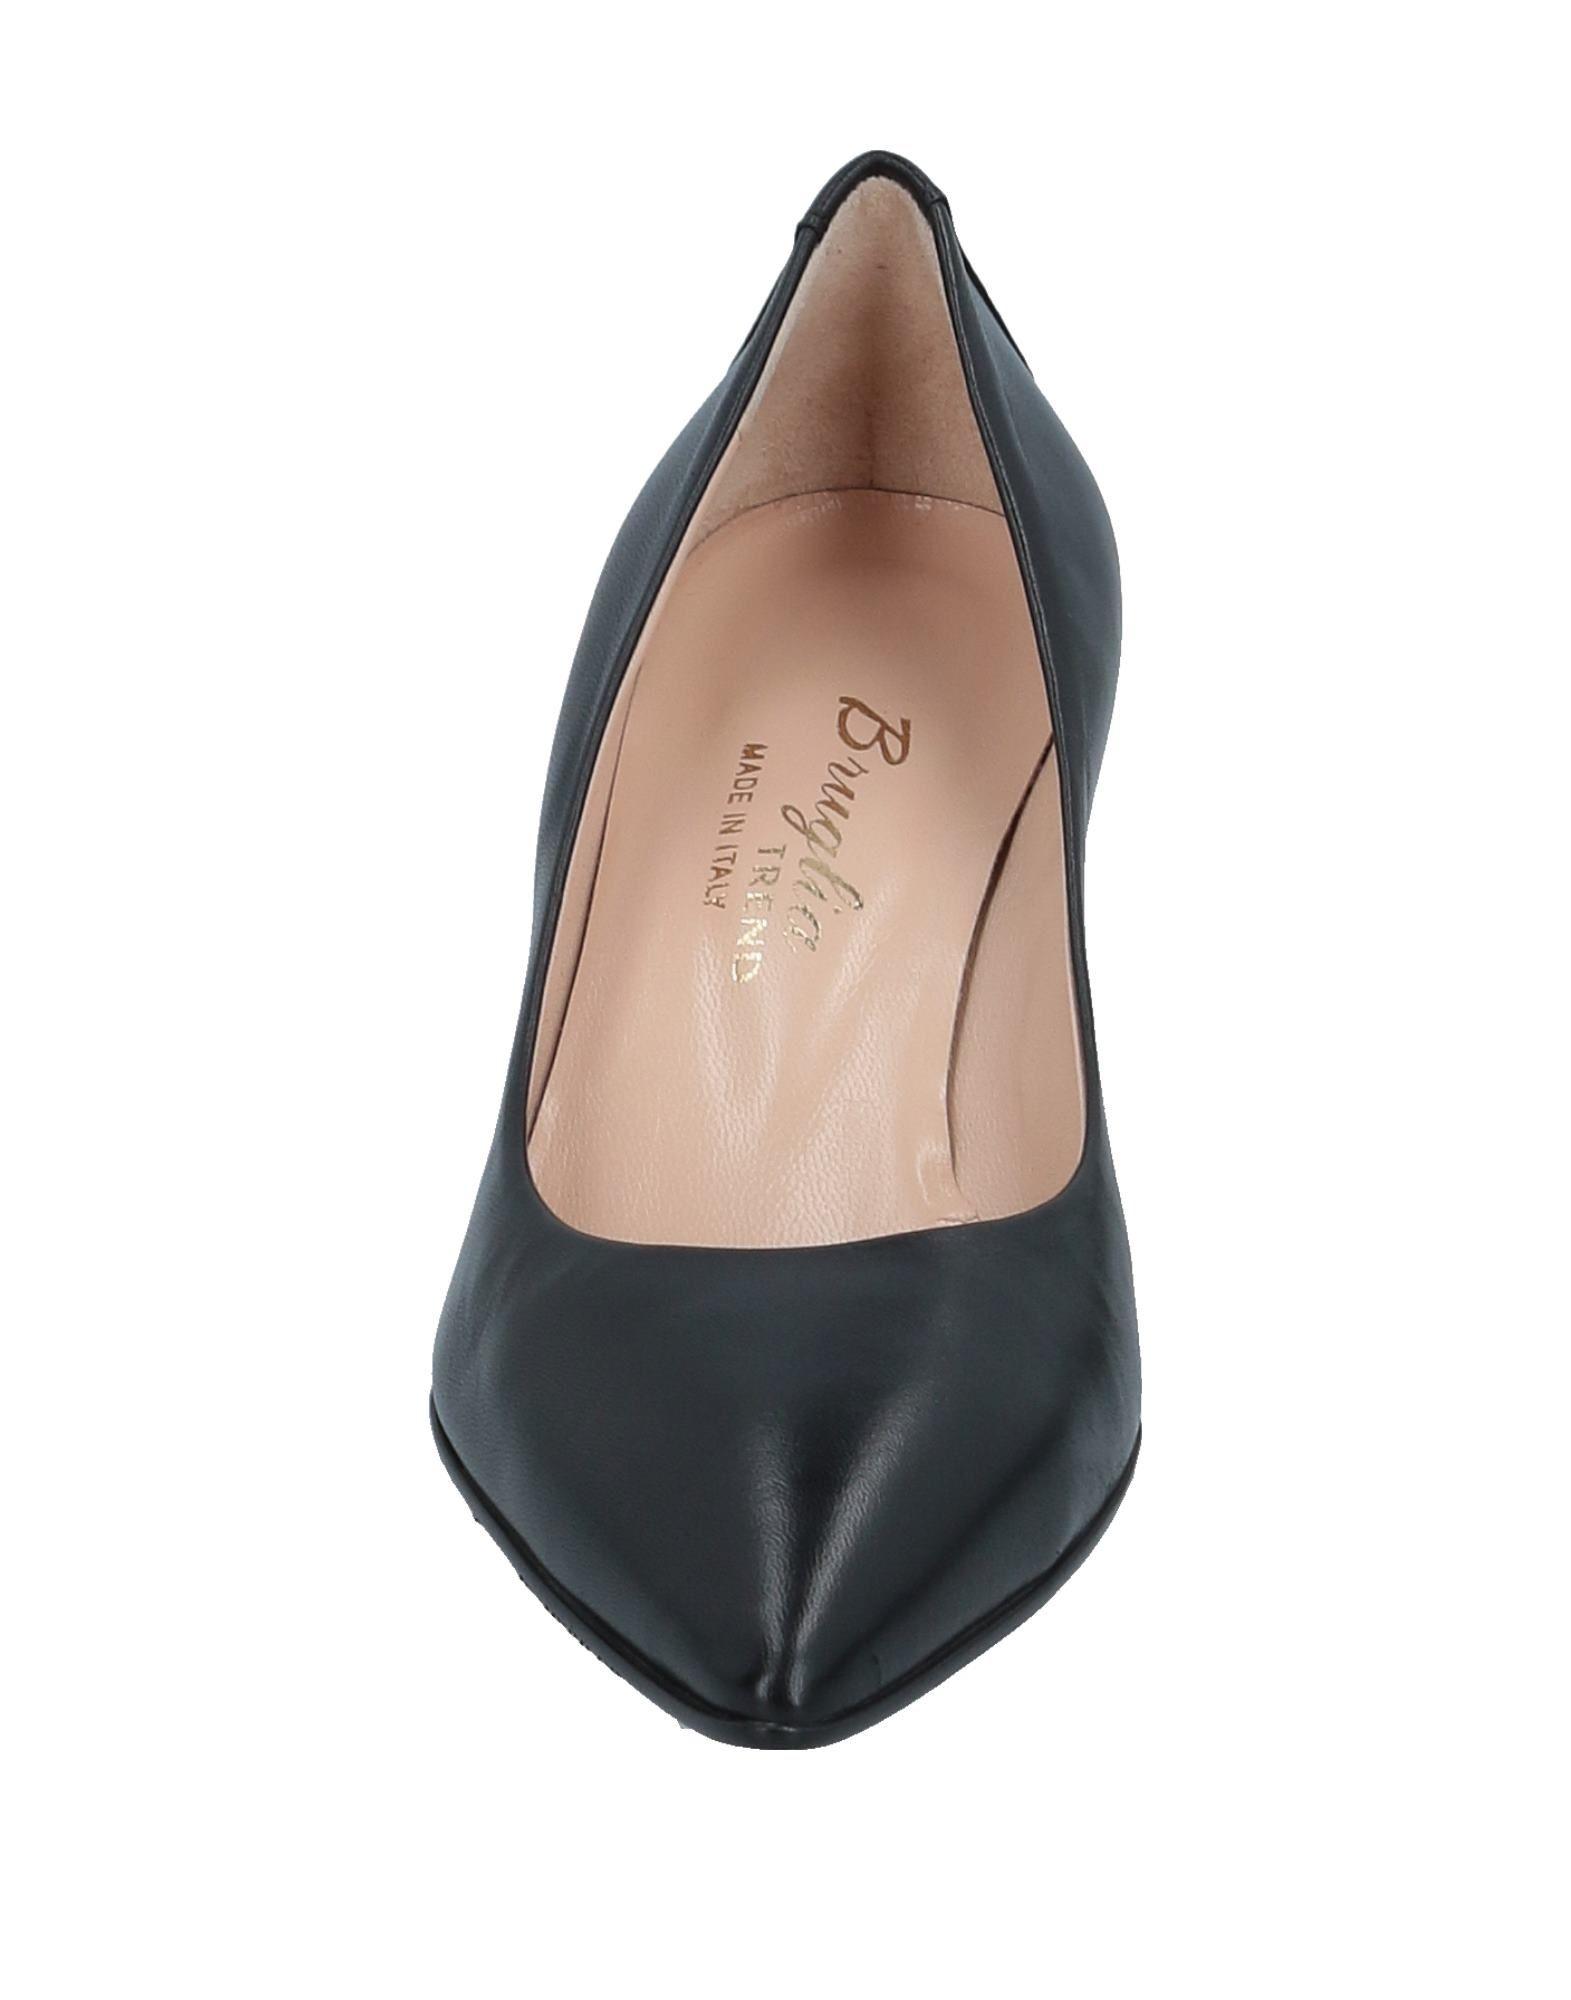 Stilvolle Pumps billige Schuhe F.Lli Bruglia Pumps Stilvolle Damen  11517849EG 932546